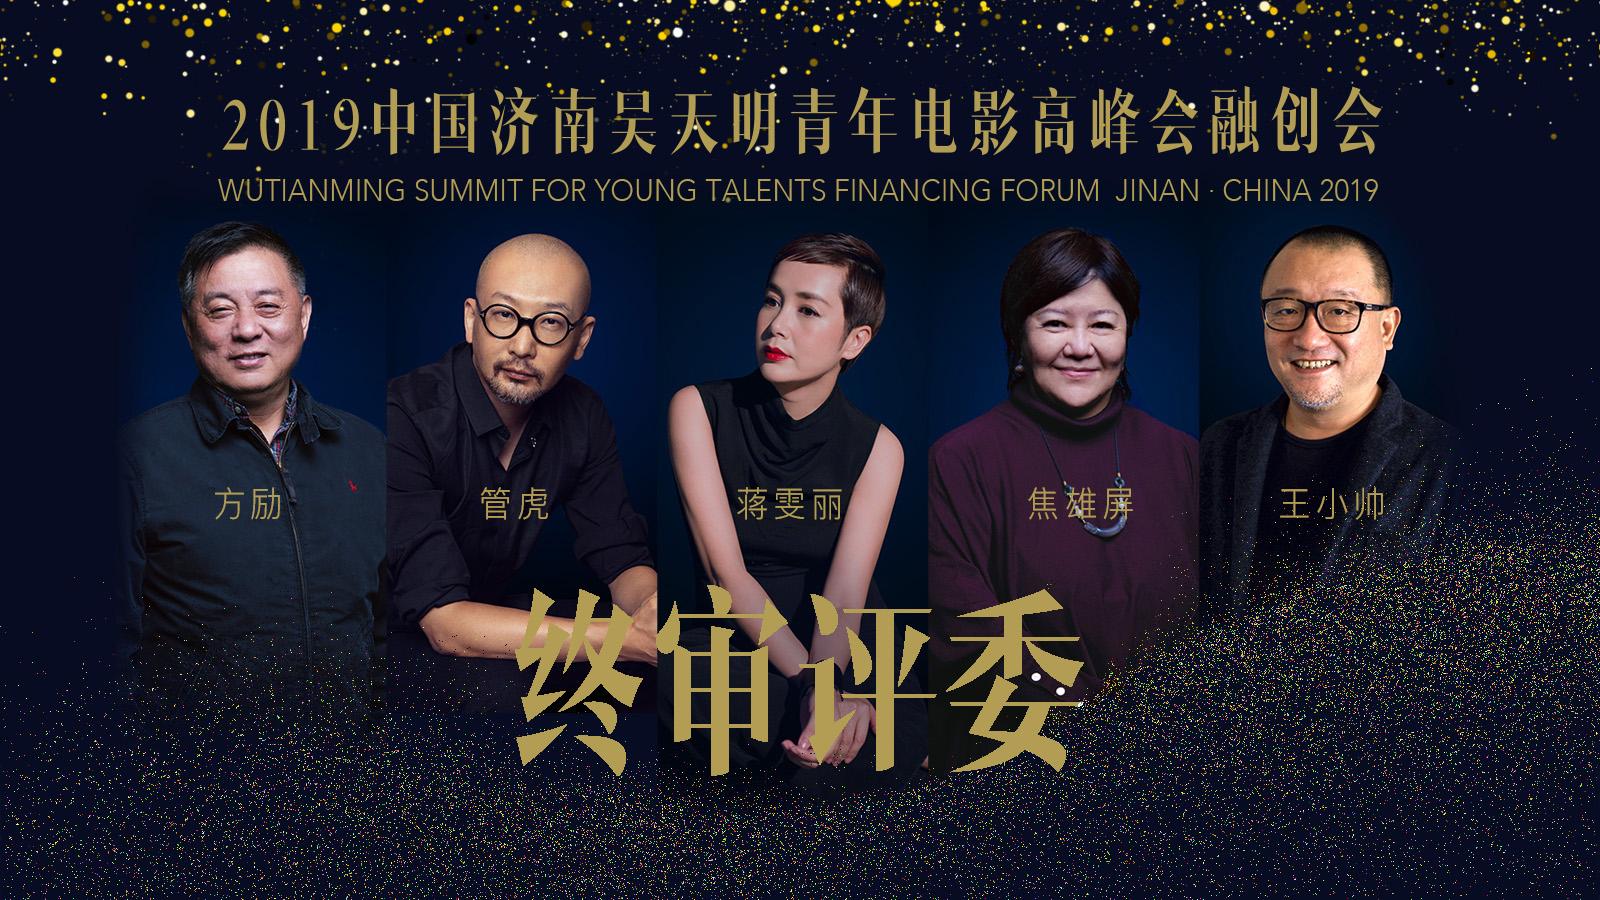 <b>2019中国济南吴天明青年电影高峰会融创会圆满举办</b>